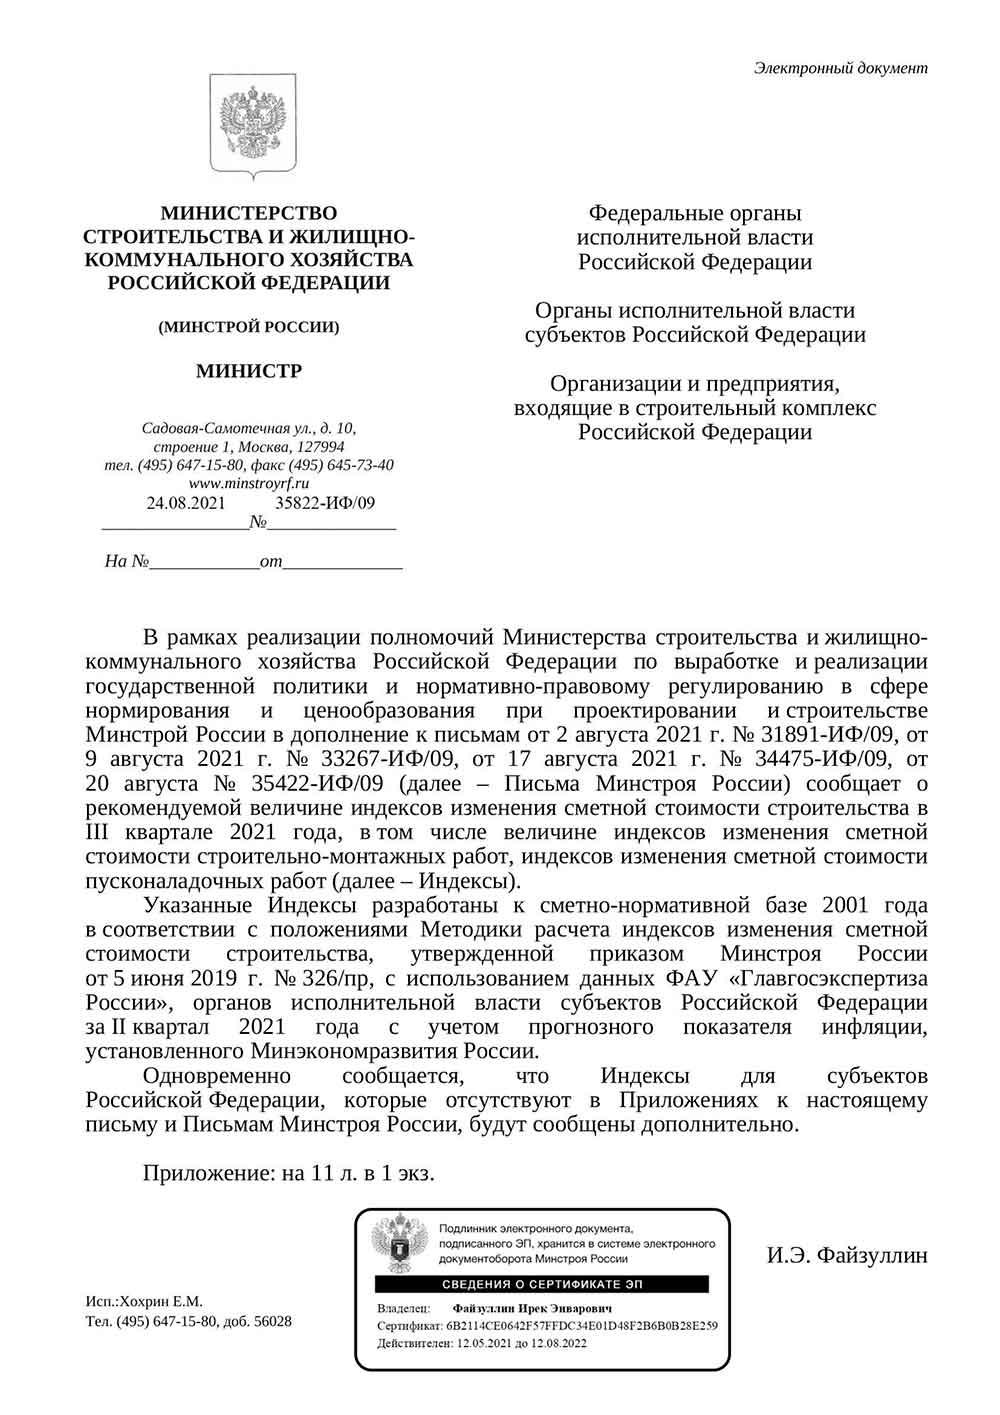 Письмо Минстроя РФ №35822-ИФ/09 от 24.08.2021 г.